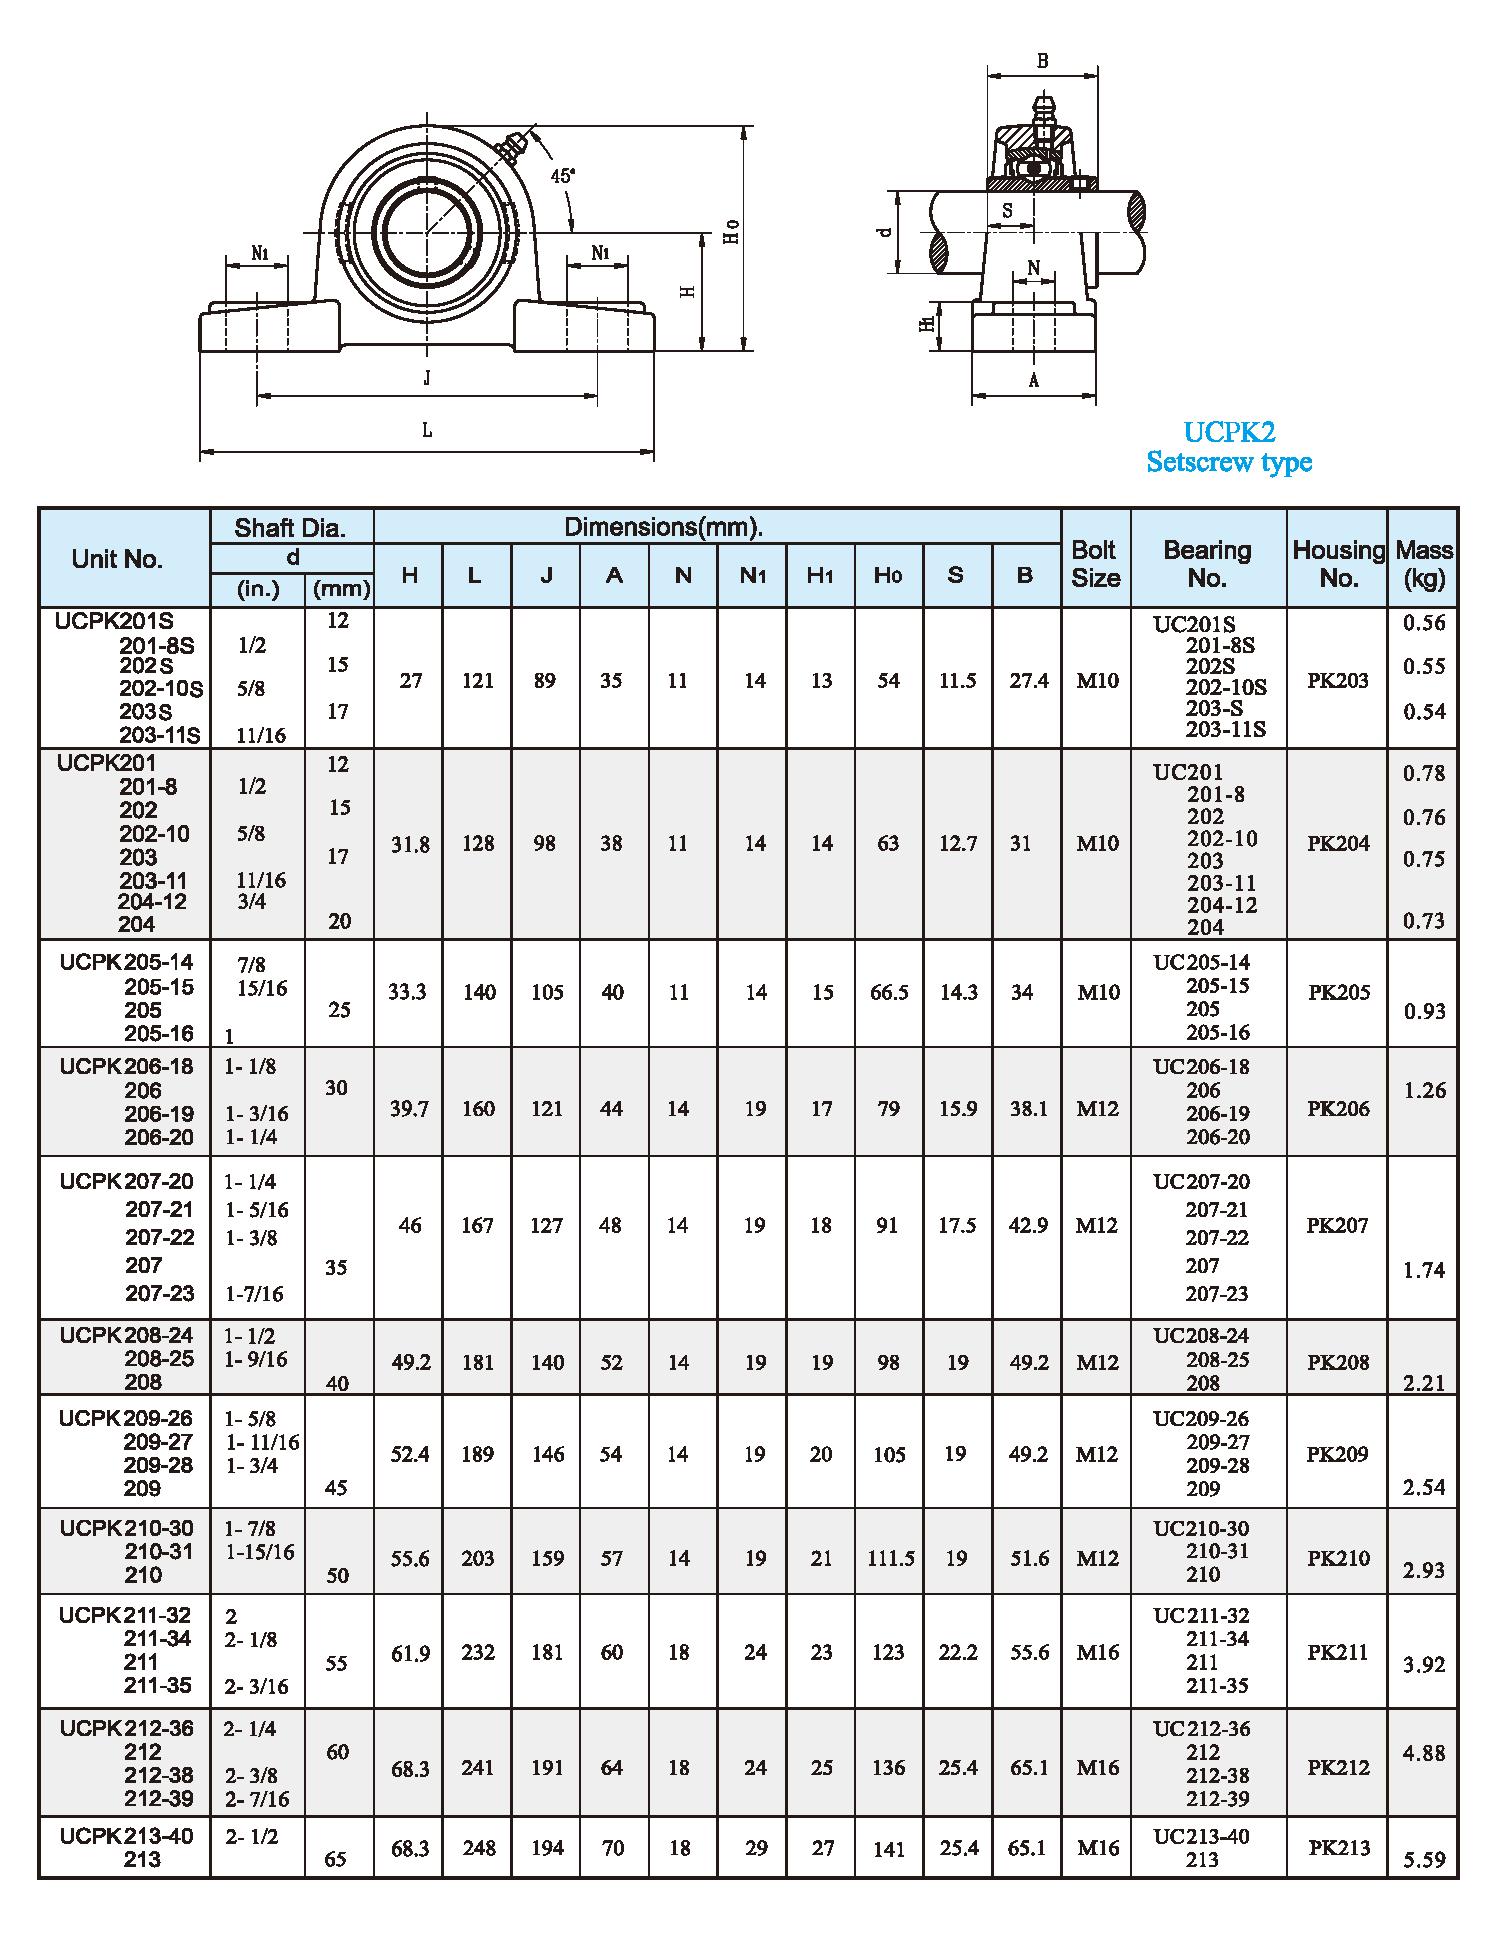 UCPK2 Setscrew type1